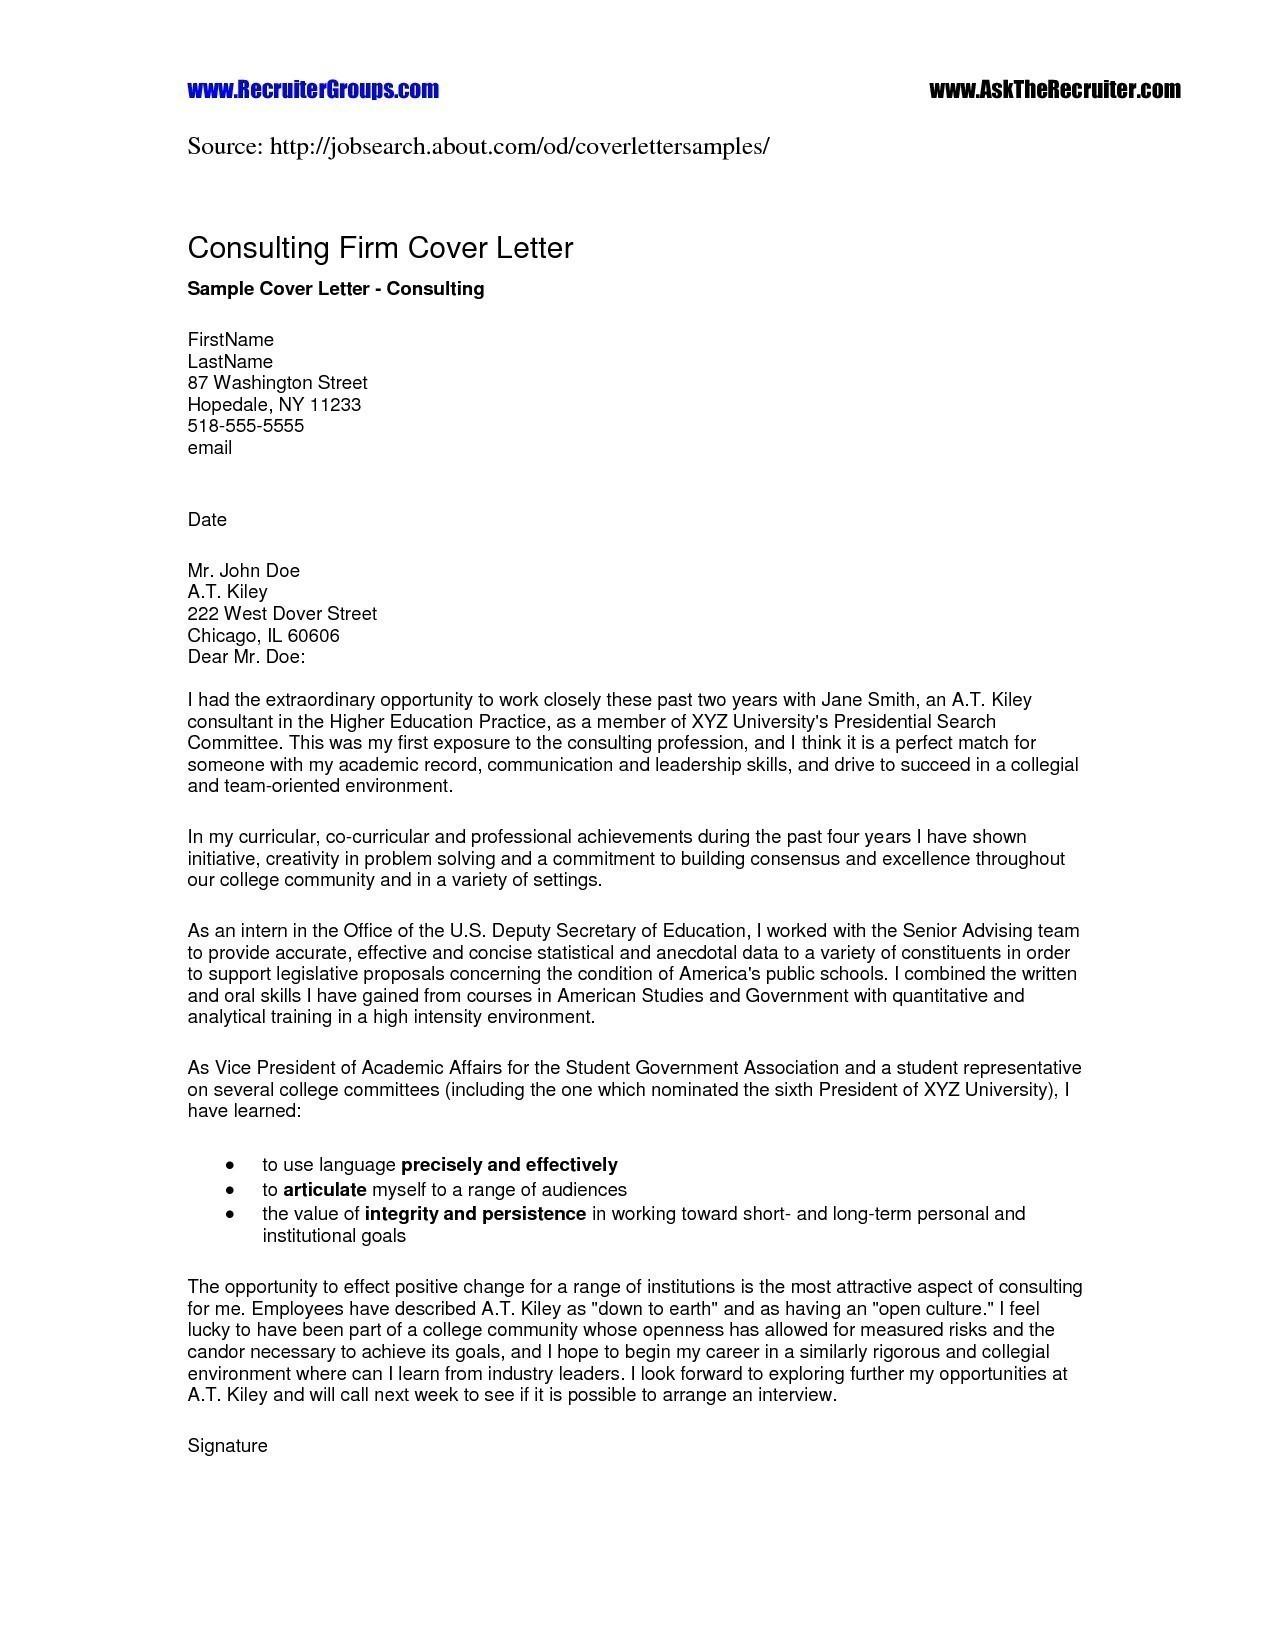 Company Offer Letter Template - Job Fer Letter Sample Best Job Fer Letter Template Us Copy Od